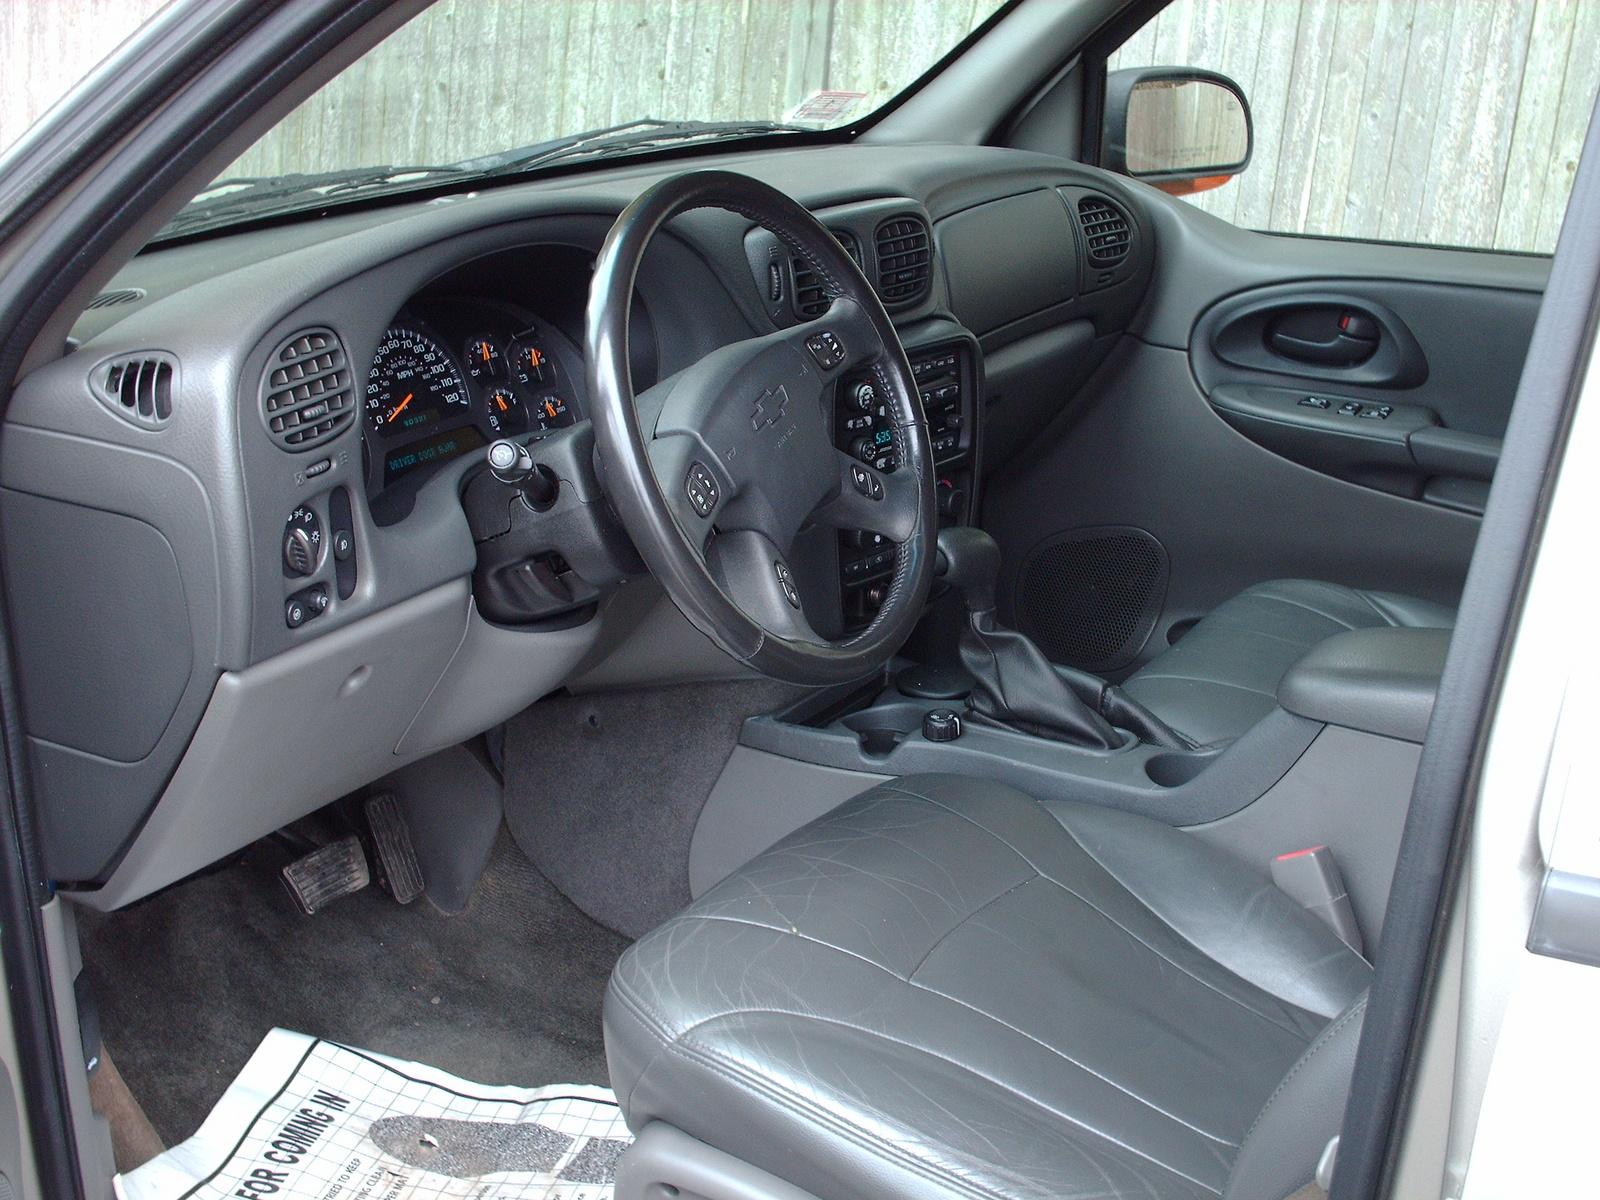 2003 Chevy Trailblazer Interior Pictures To Pin On Pinterest Pinsdaddy